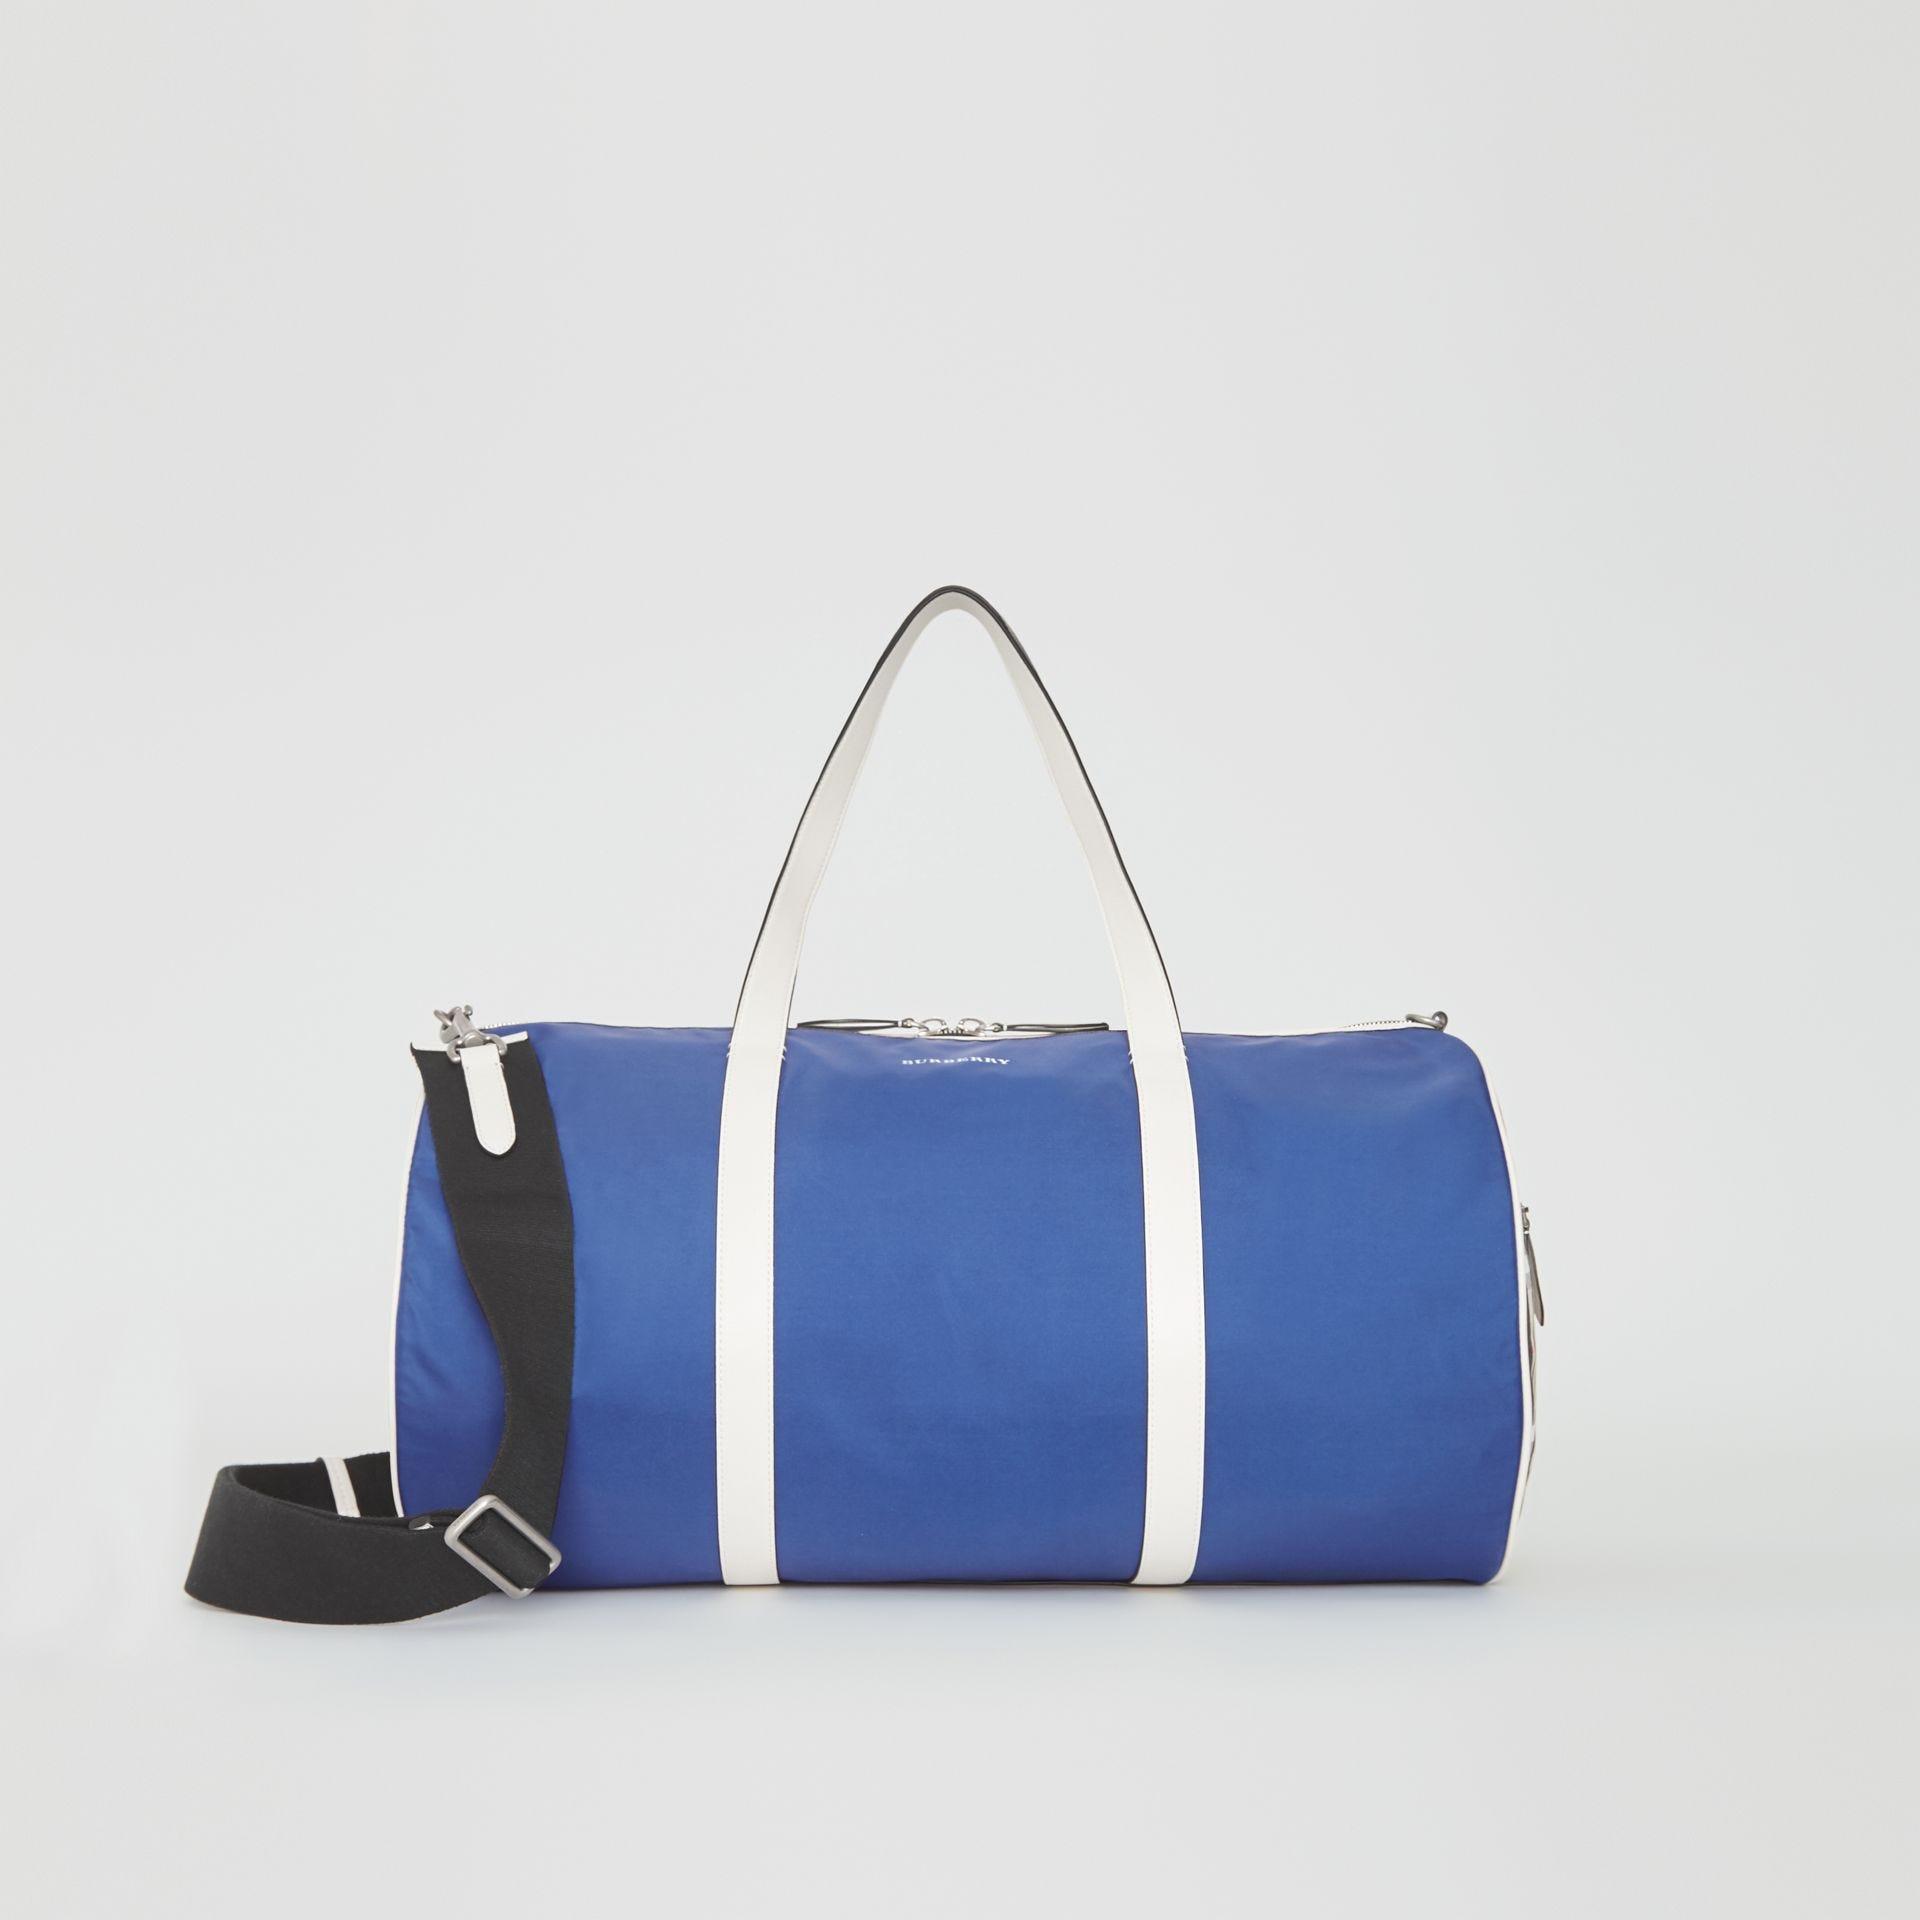 Best Travel Duffel Bags For Labor Day 2018 0eabc947eaf36